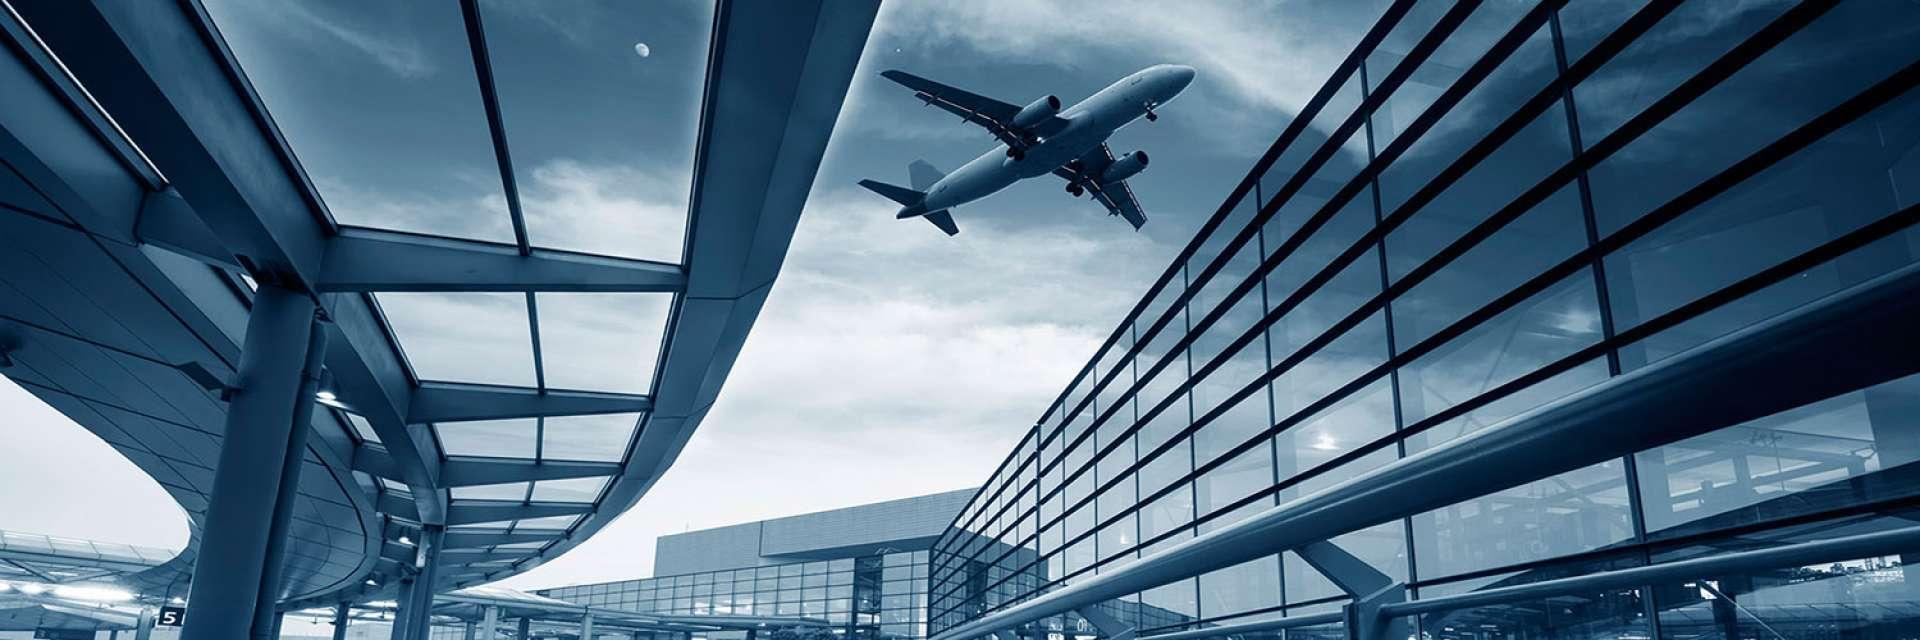 izmir havalimanı rent a car